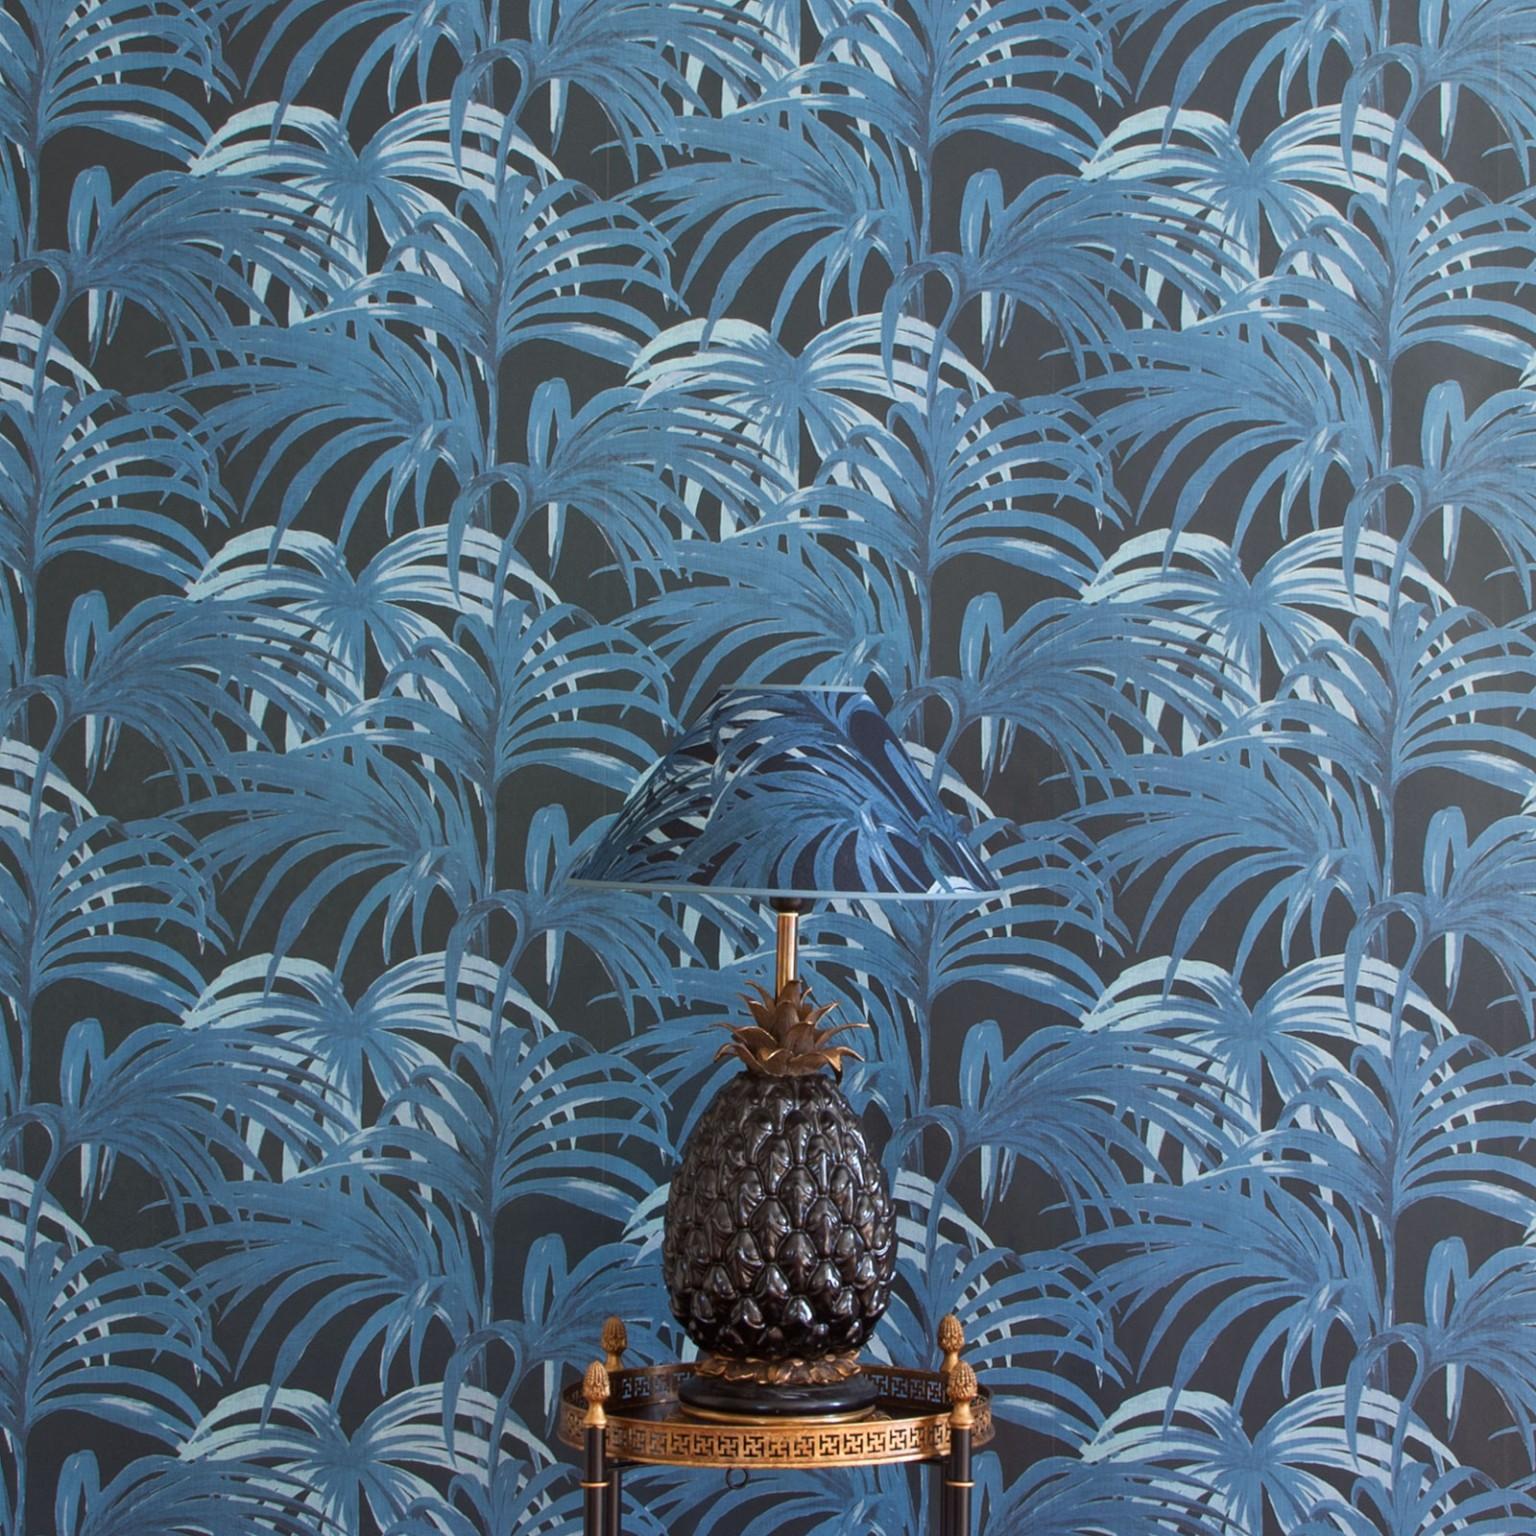 palmeral-luxury-wallpaper---midnight-azure-_-lamps.jpg